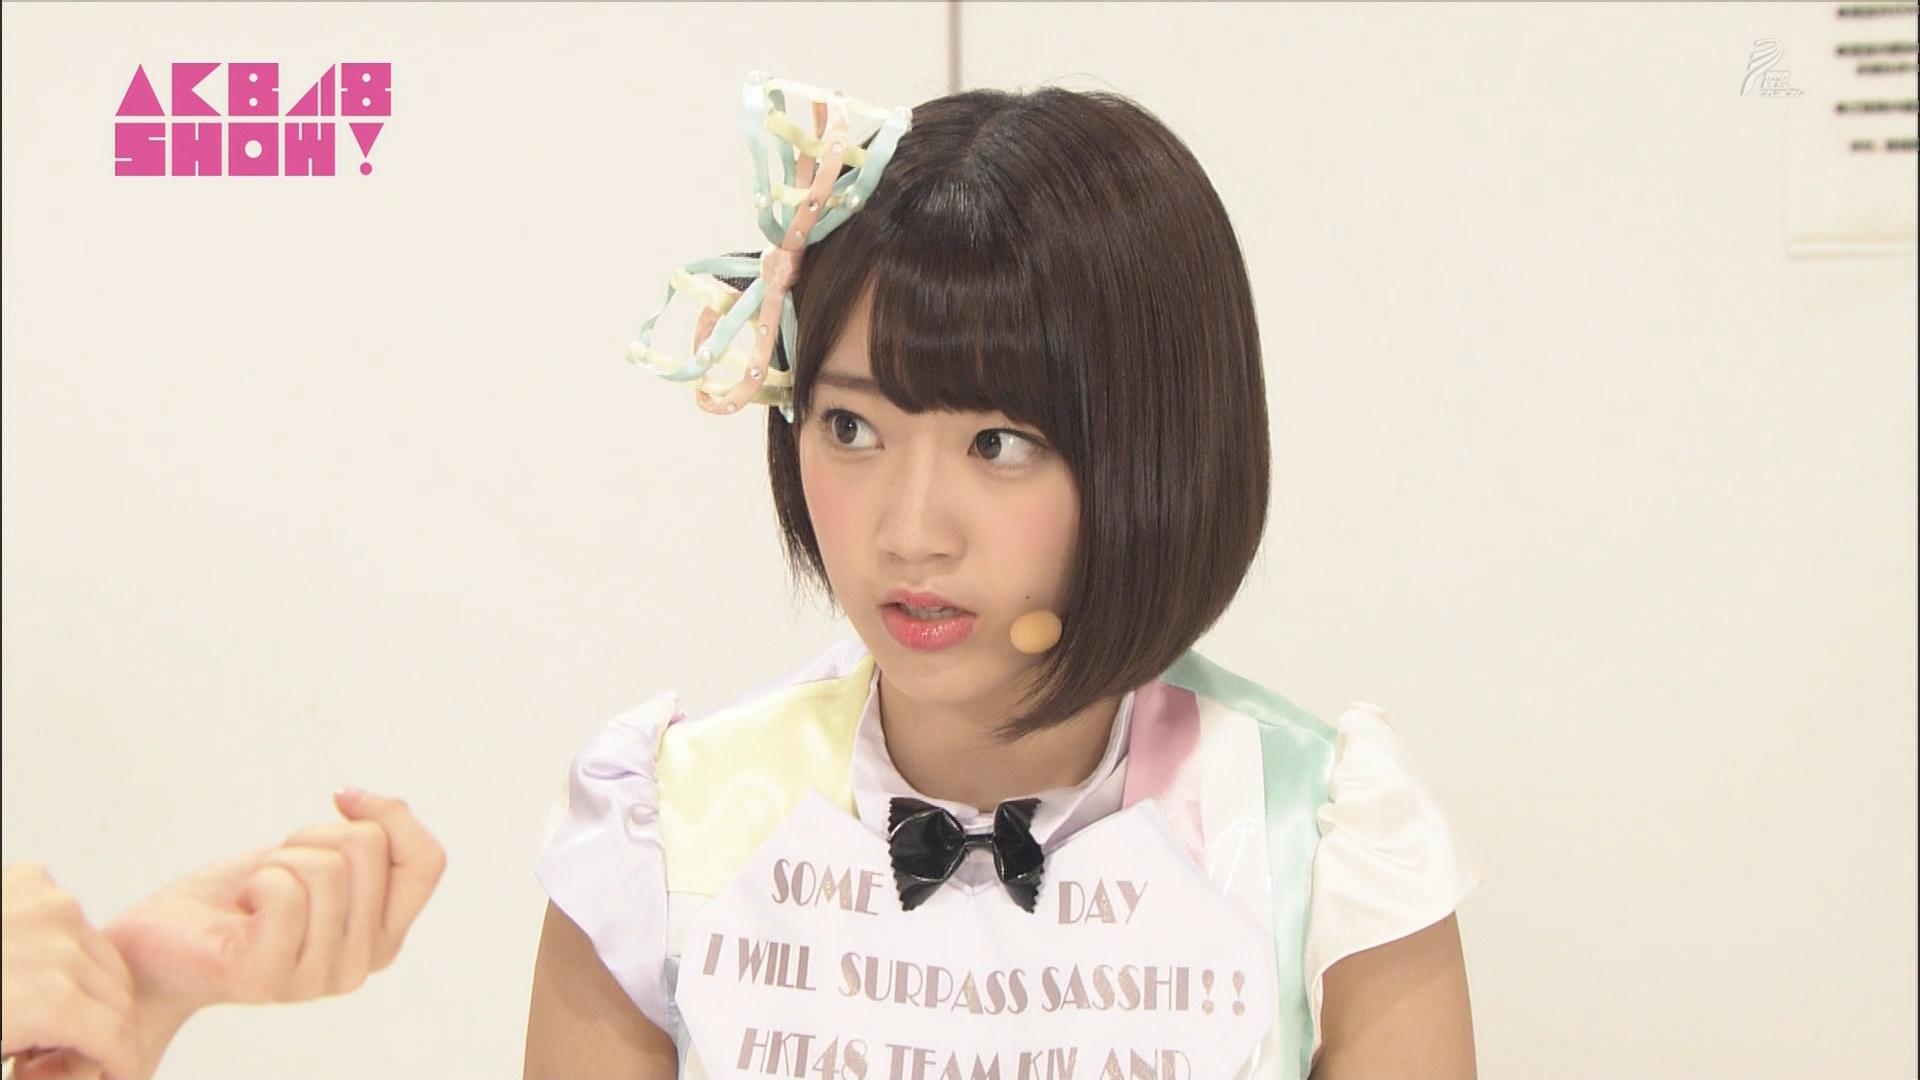 AKB48SHOW 心のプラカード 宮脇咲良 20140830 (3)